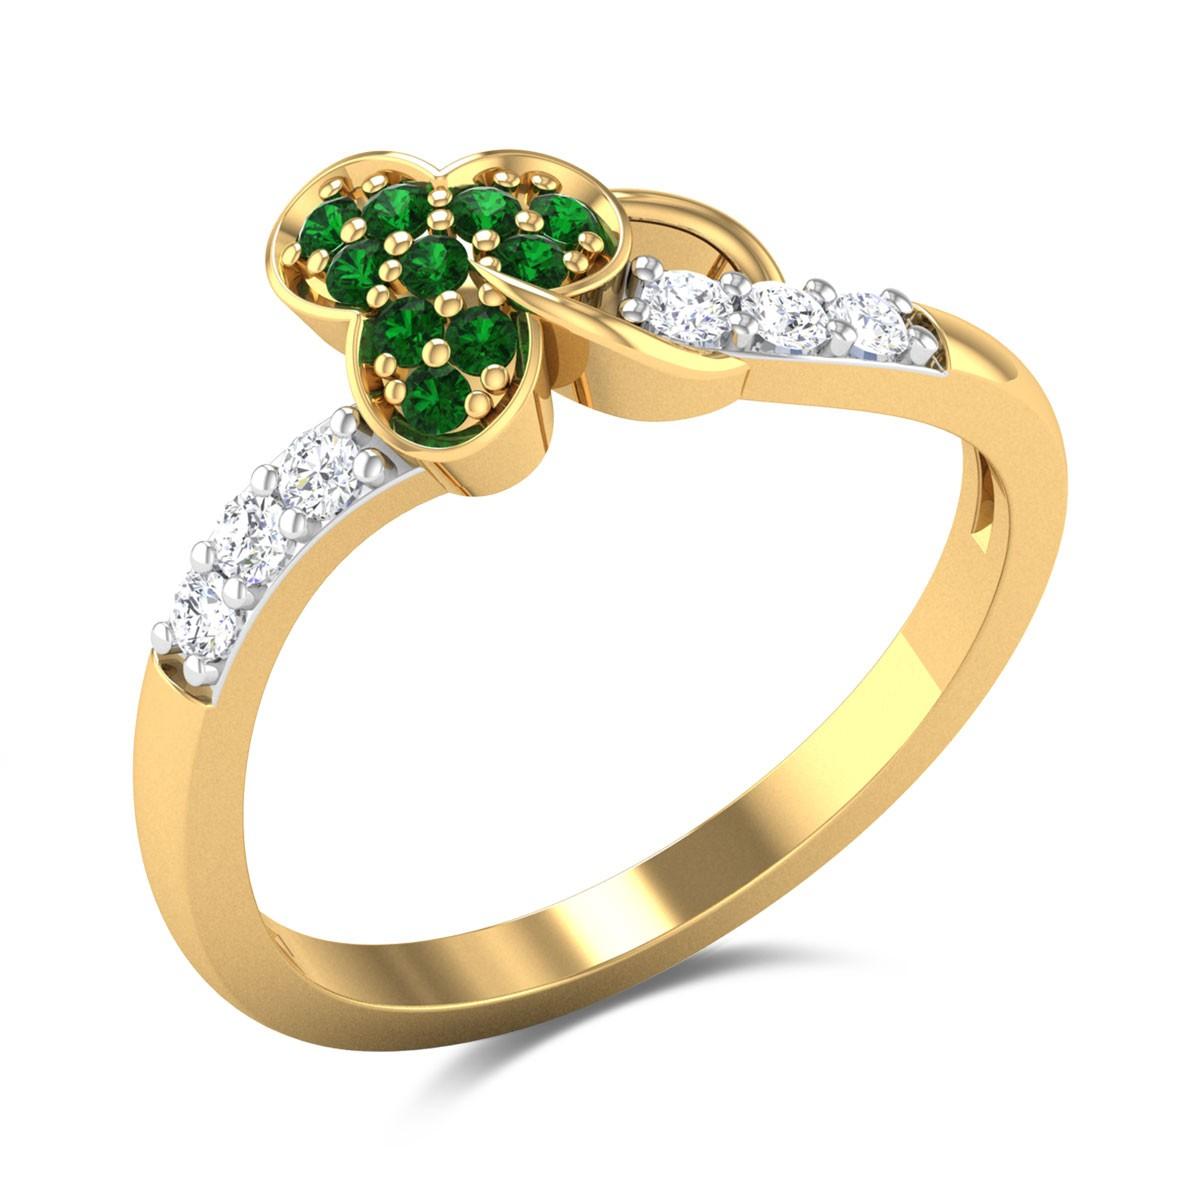 Adreanna Emerald Ring